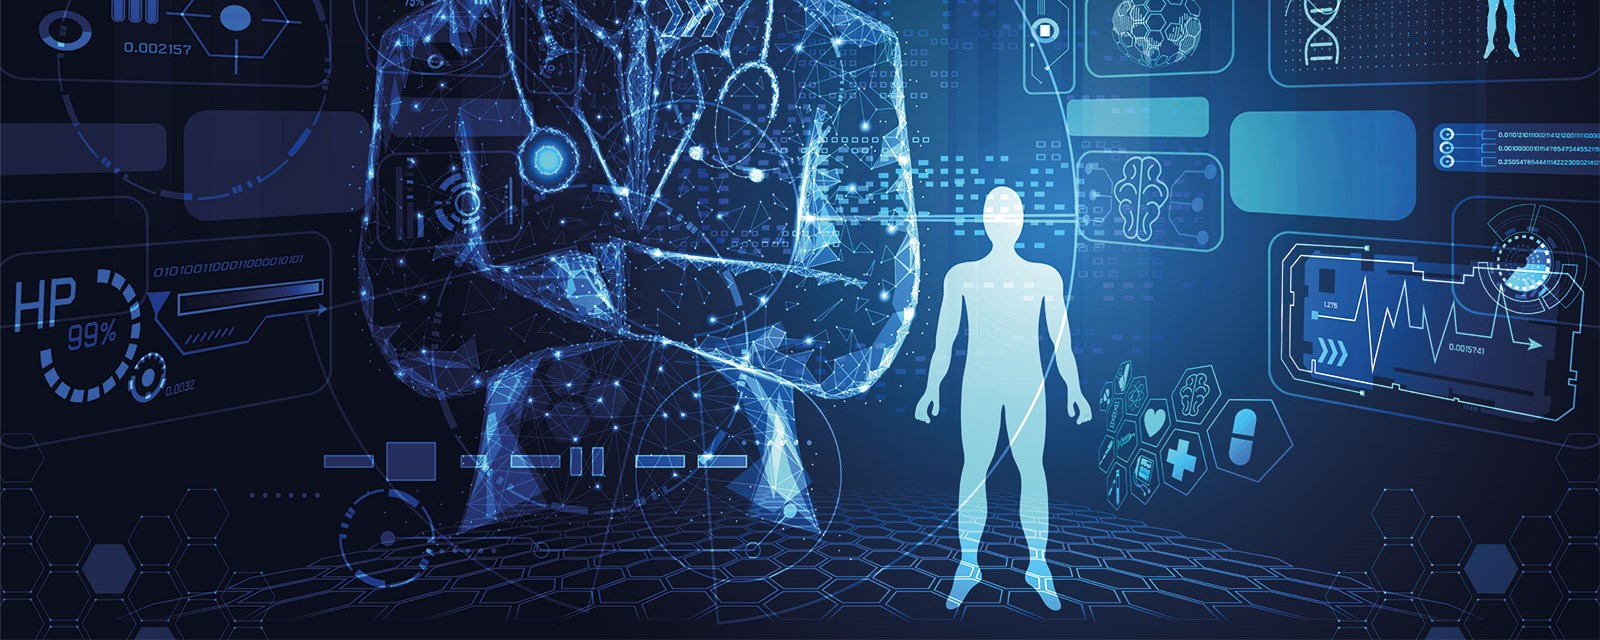 Recent Developments in AI & Digital Health 2020